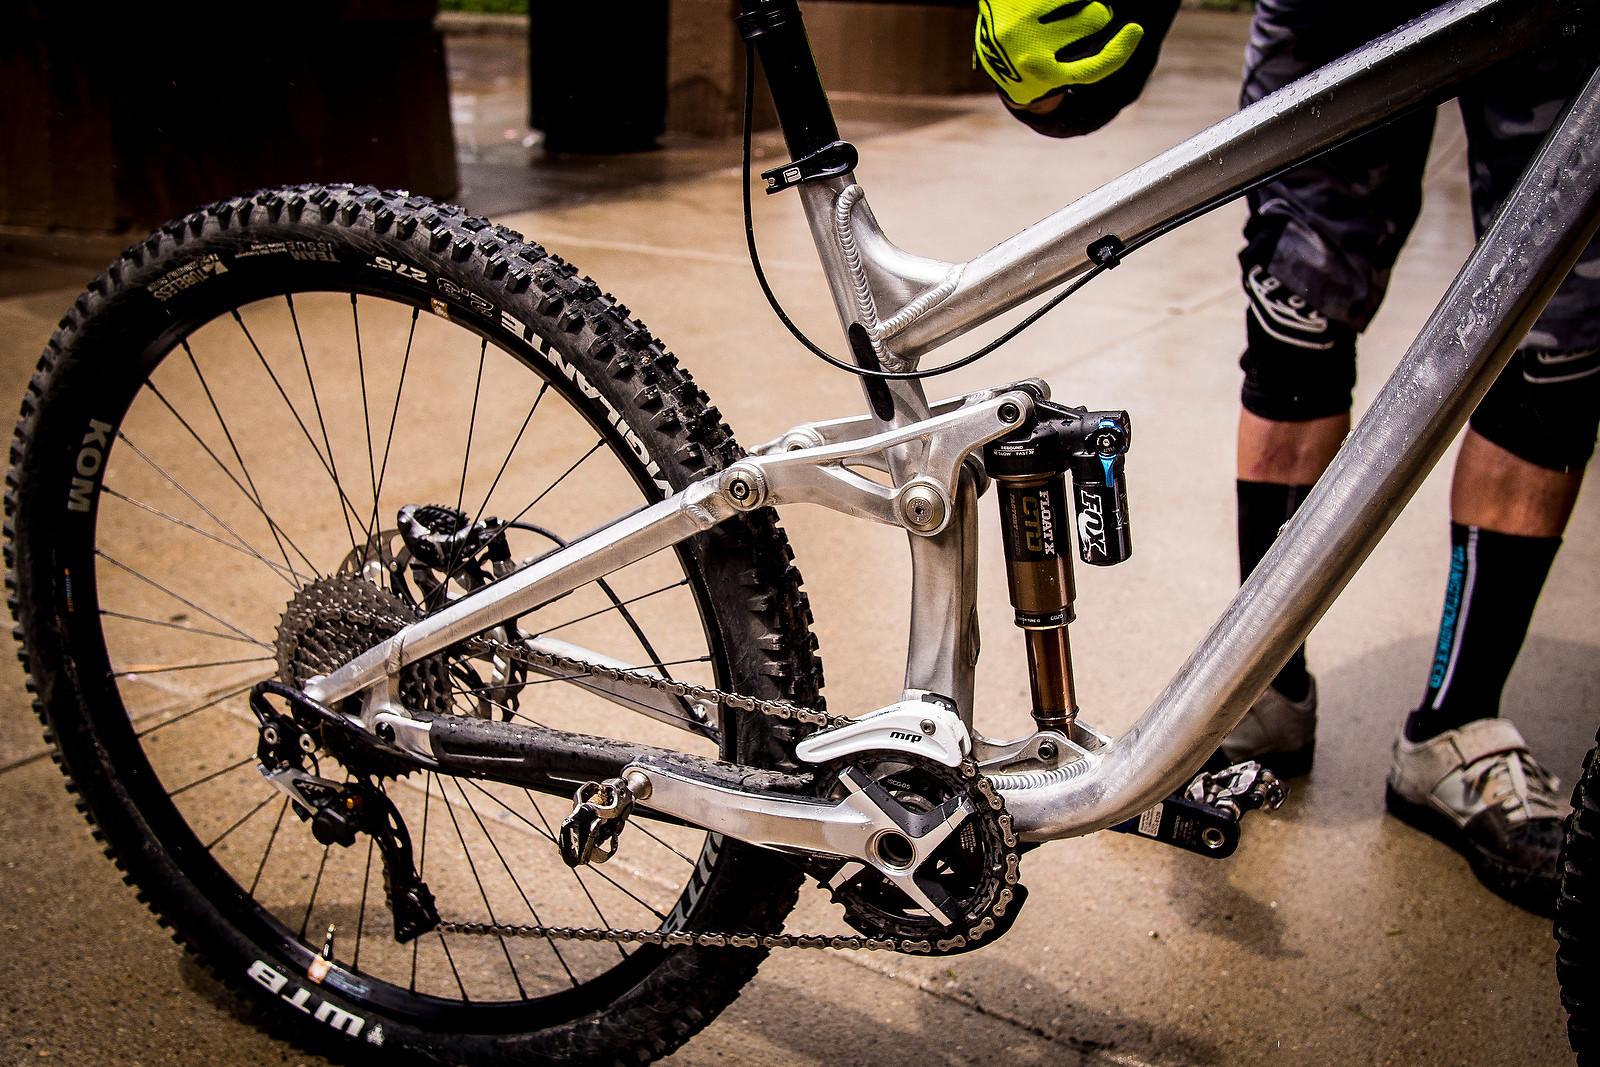 Lars Sternberg's Prototype Transition Enduro Race Bike - PIT BITS - 2014 Enduro World Series Colorado Freeride Festival - Mountain Biking Pictures - Vital MTB